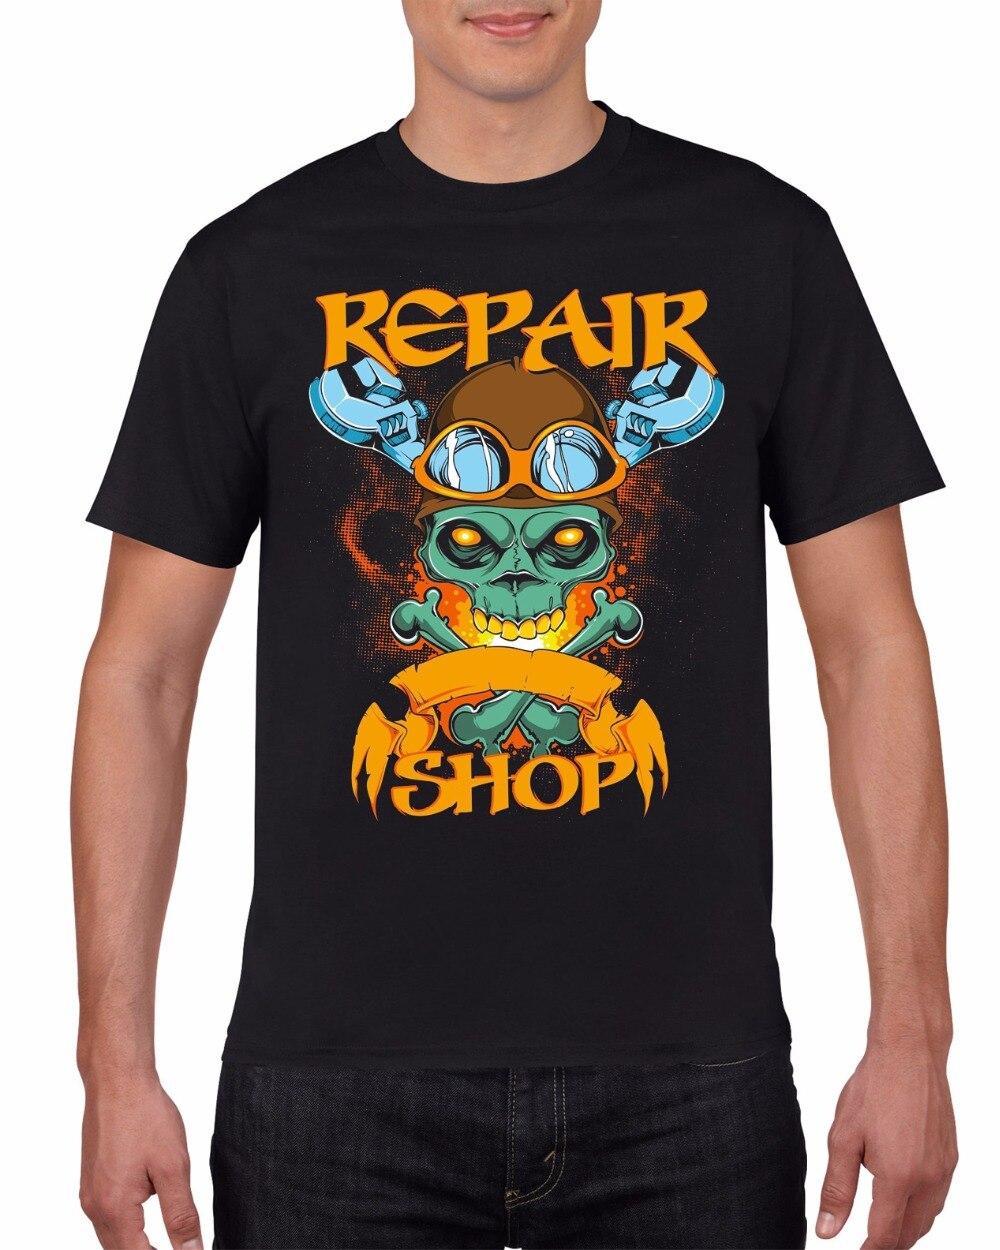 2018 Mens T-Shirt Fashion O Neck T-Shirt Black T-Shirt Repair Shop Skull and Wrench Tee Shirt